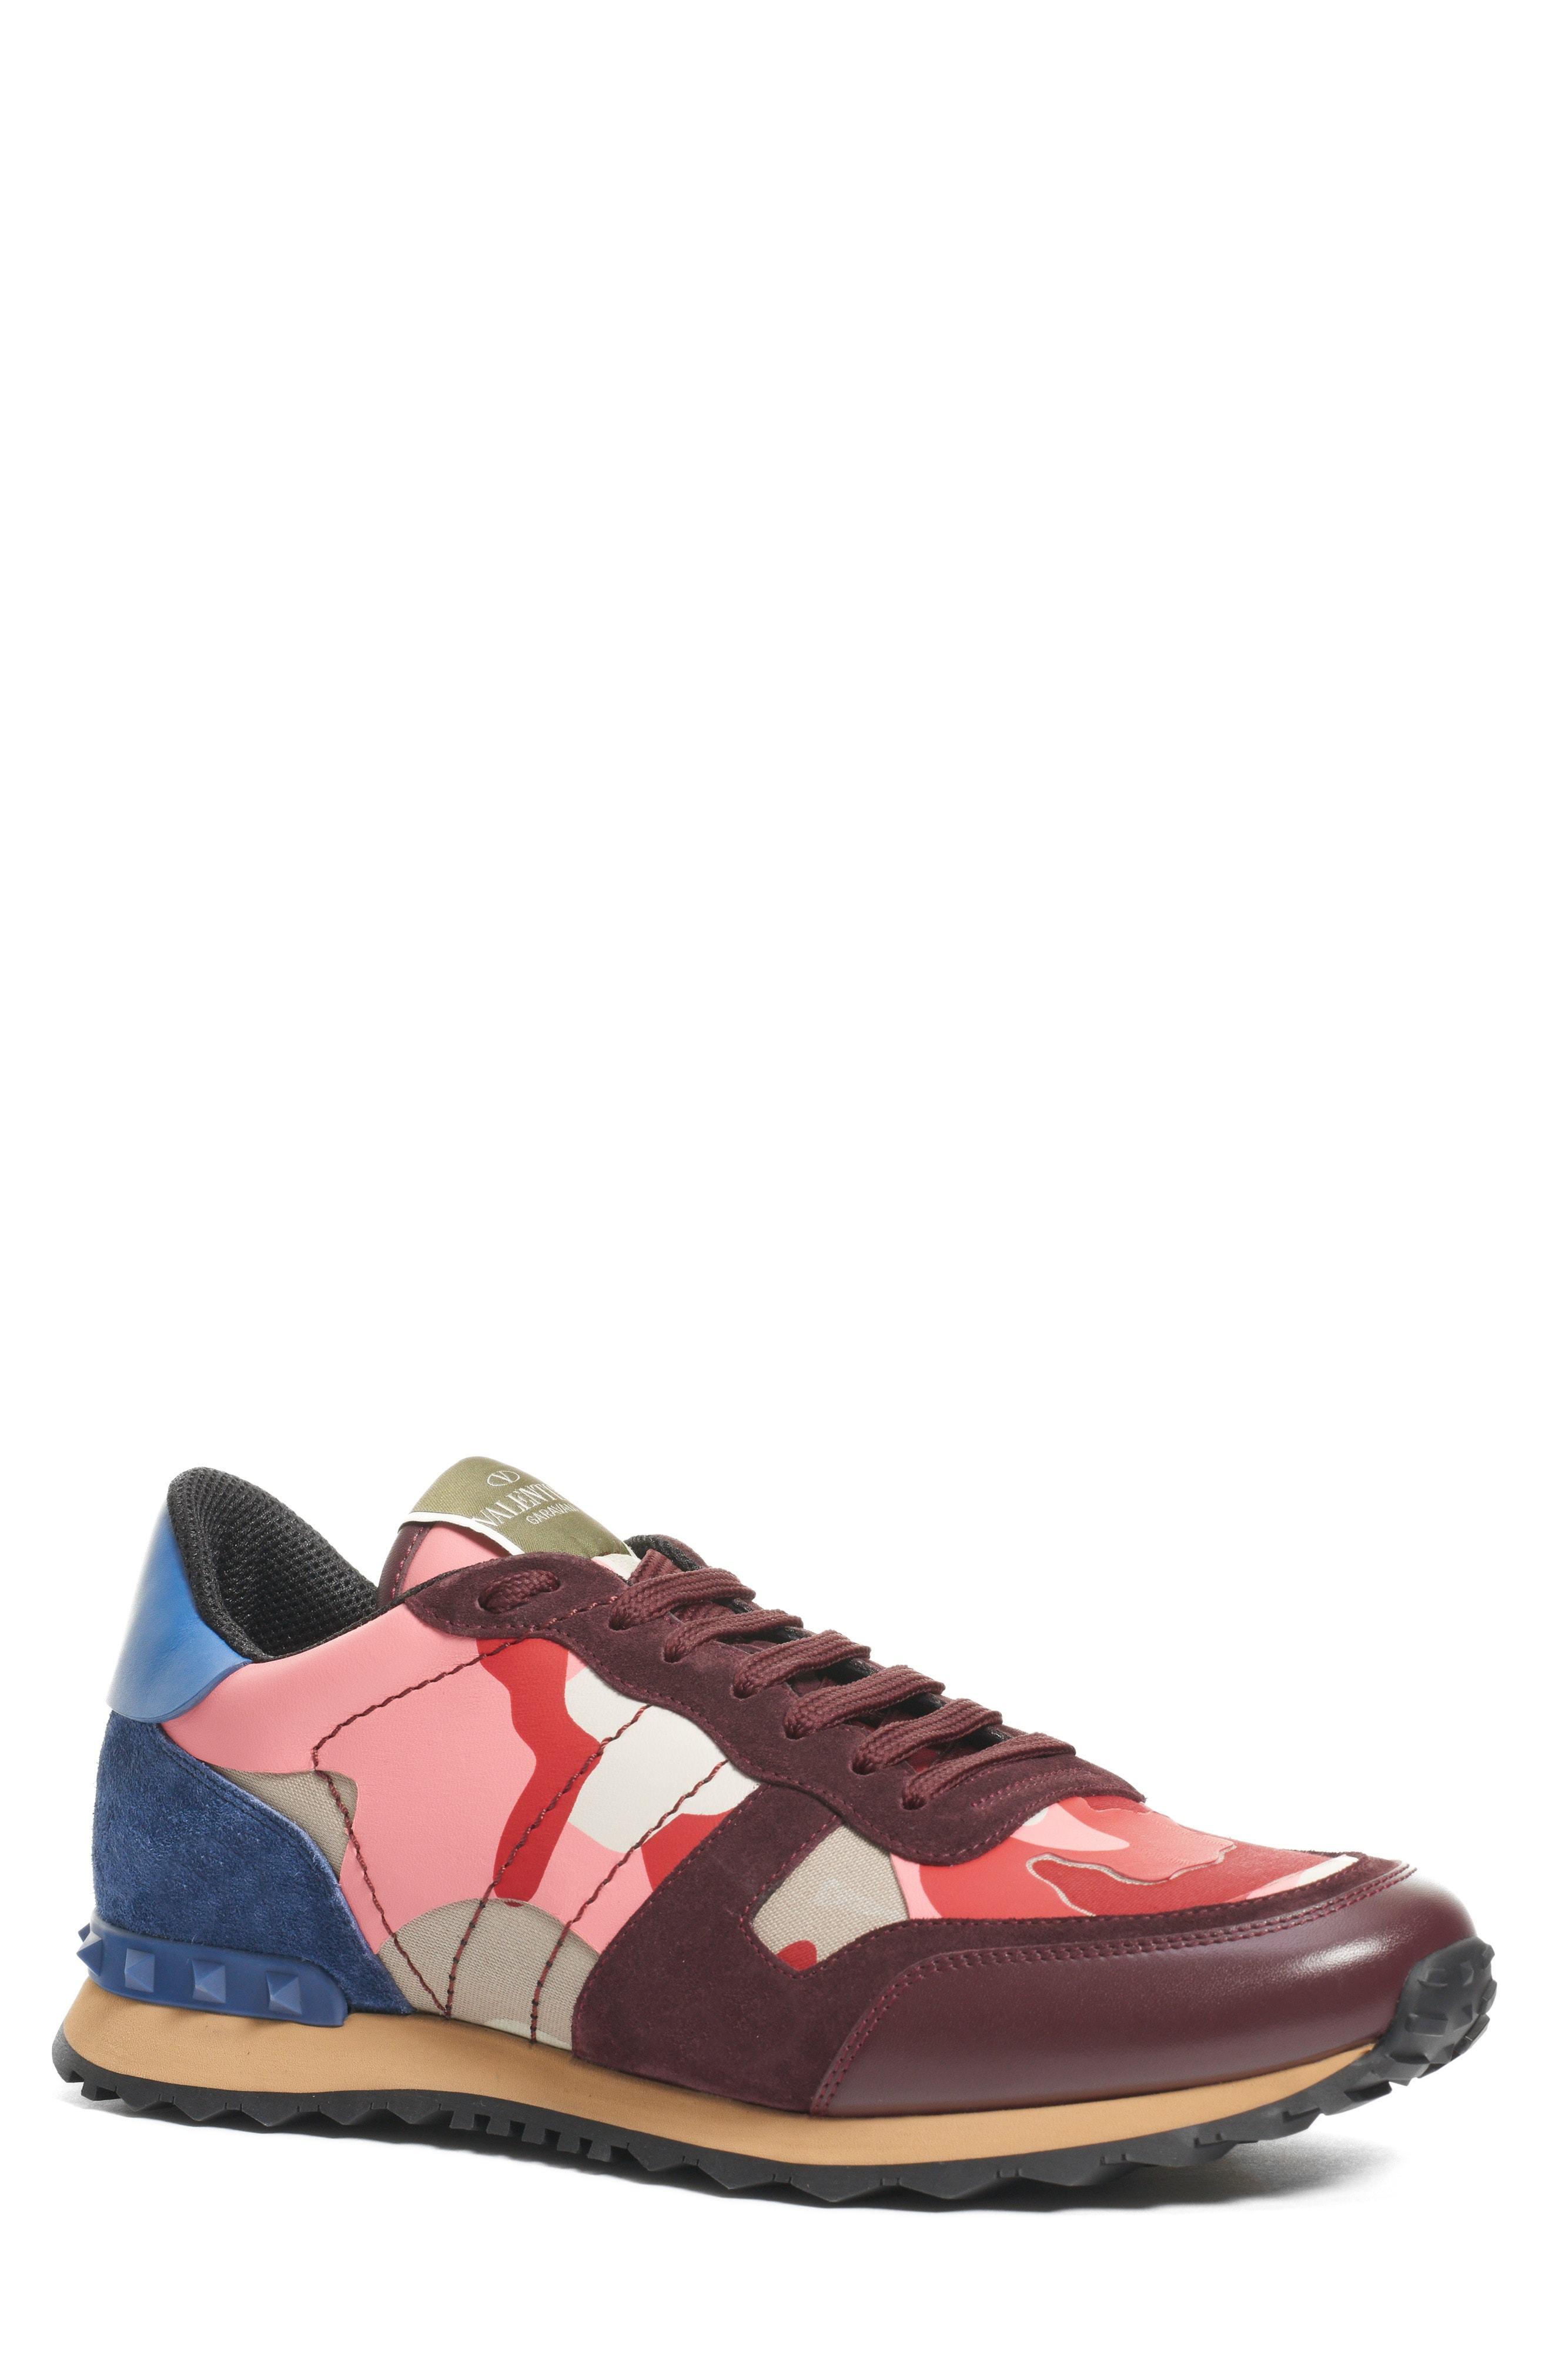 f958493eaa Valentino Garavani Camo Rockrunner Sneaker 795 Nordstrom Shoes ...